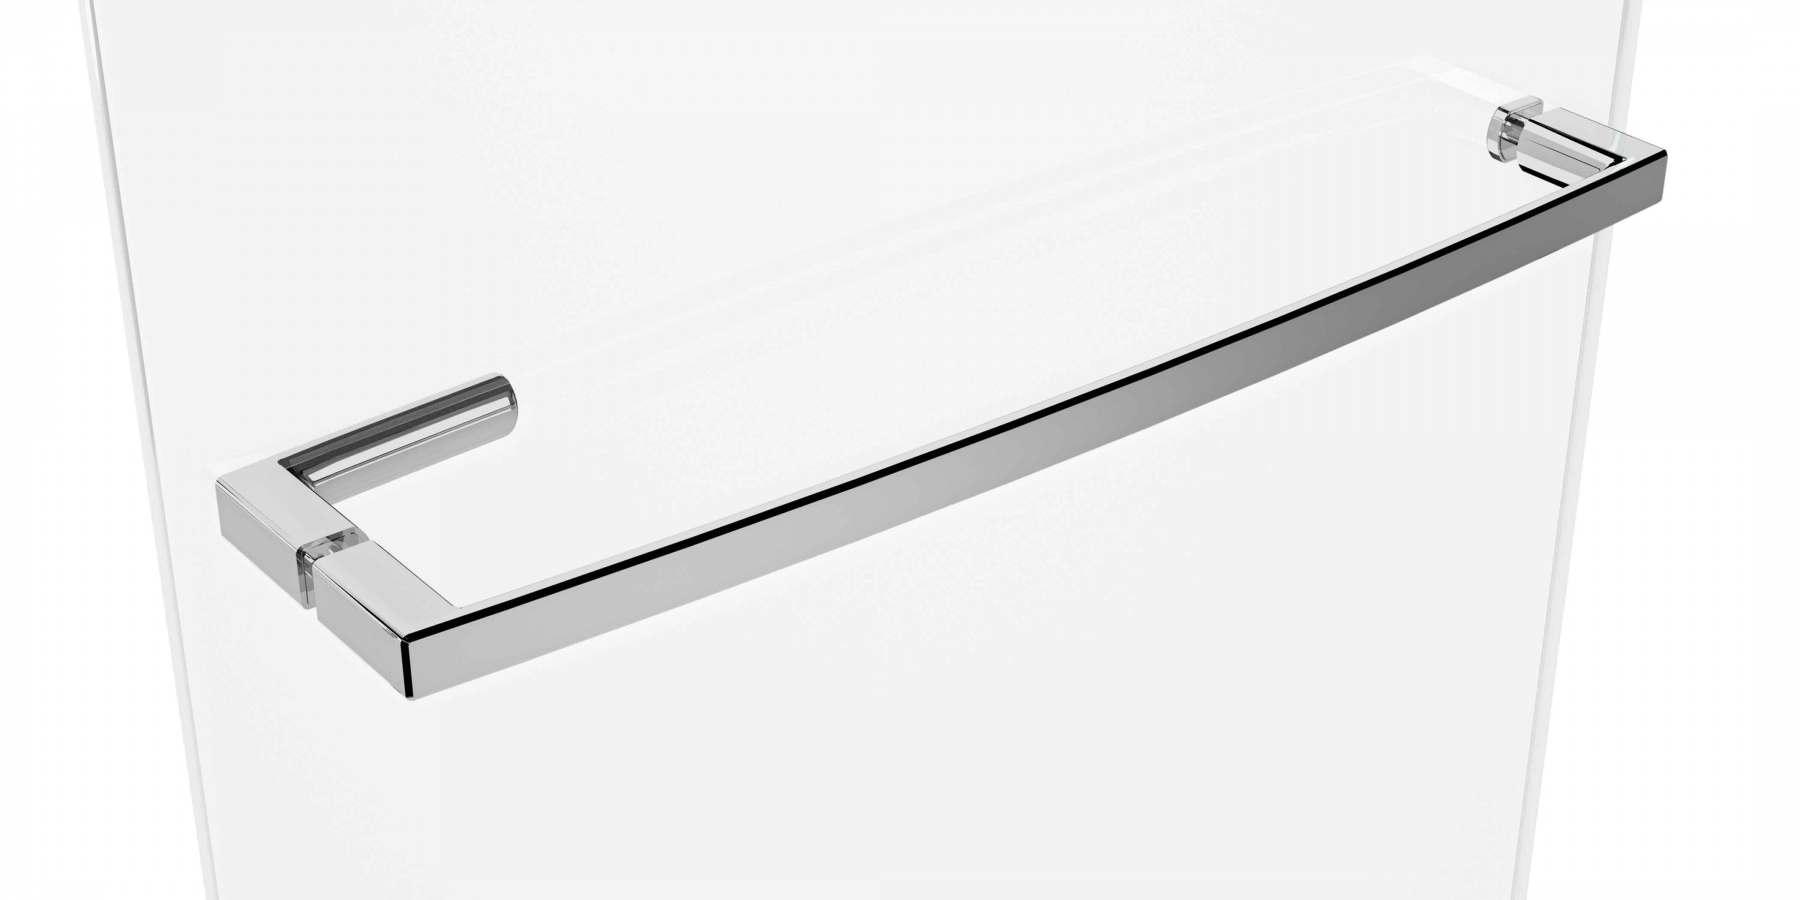 ARYSTOX_Towel-Rail-Handle_Close-up.LR_